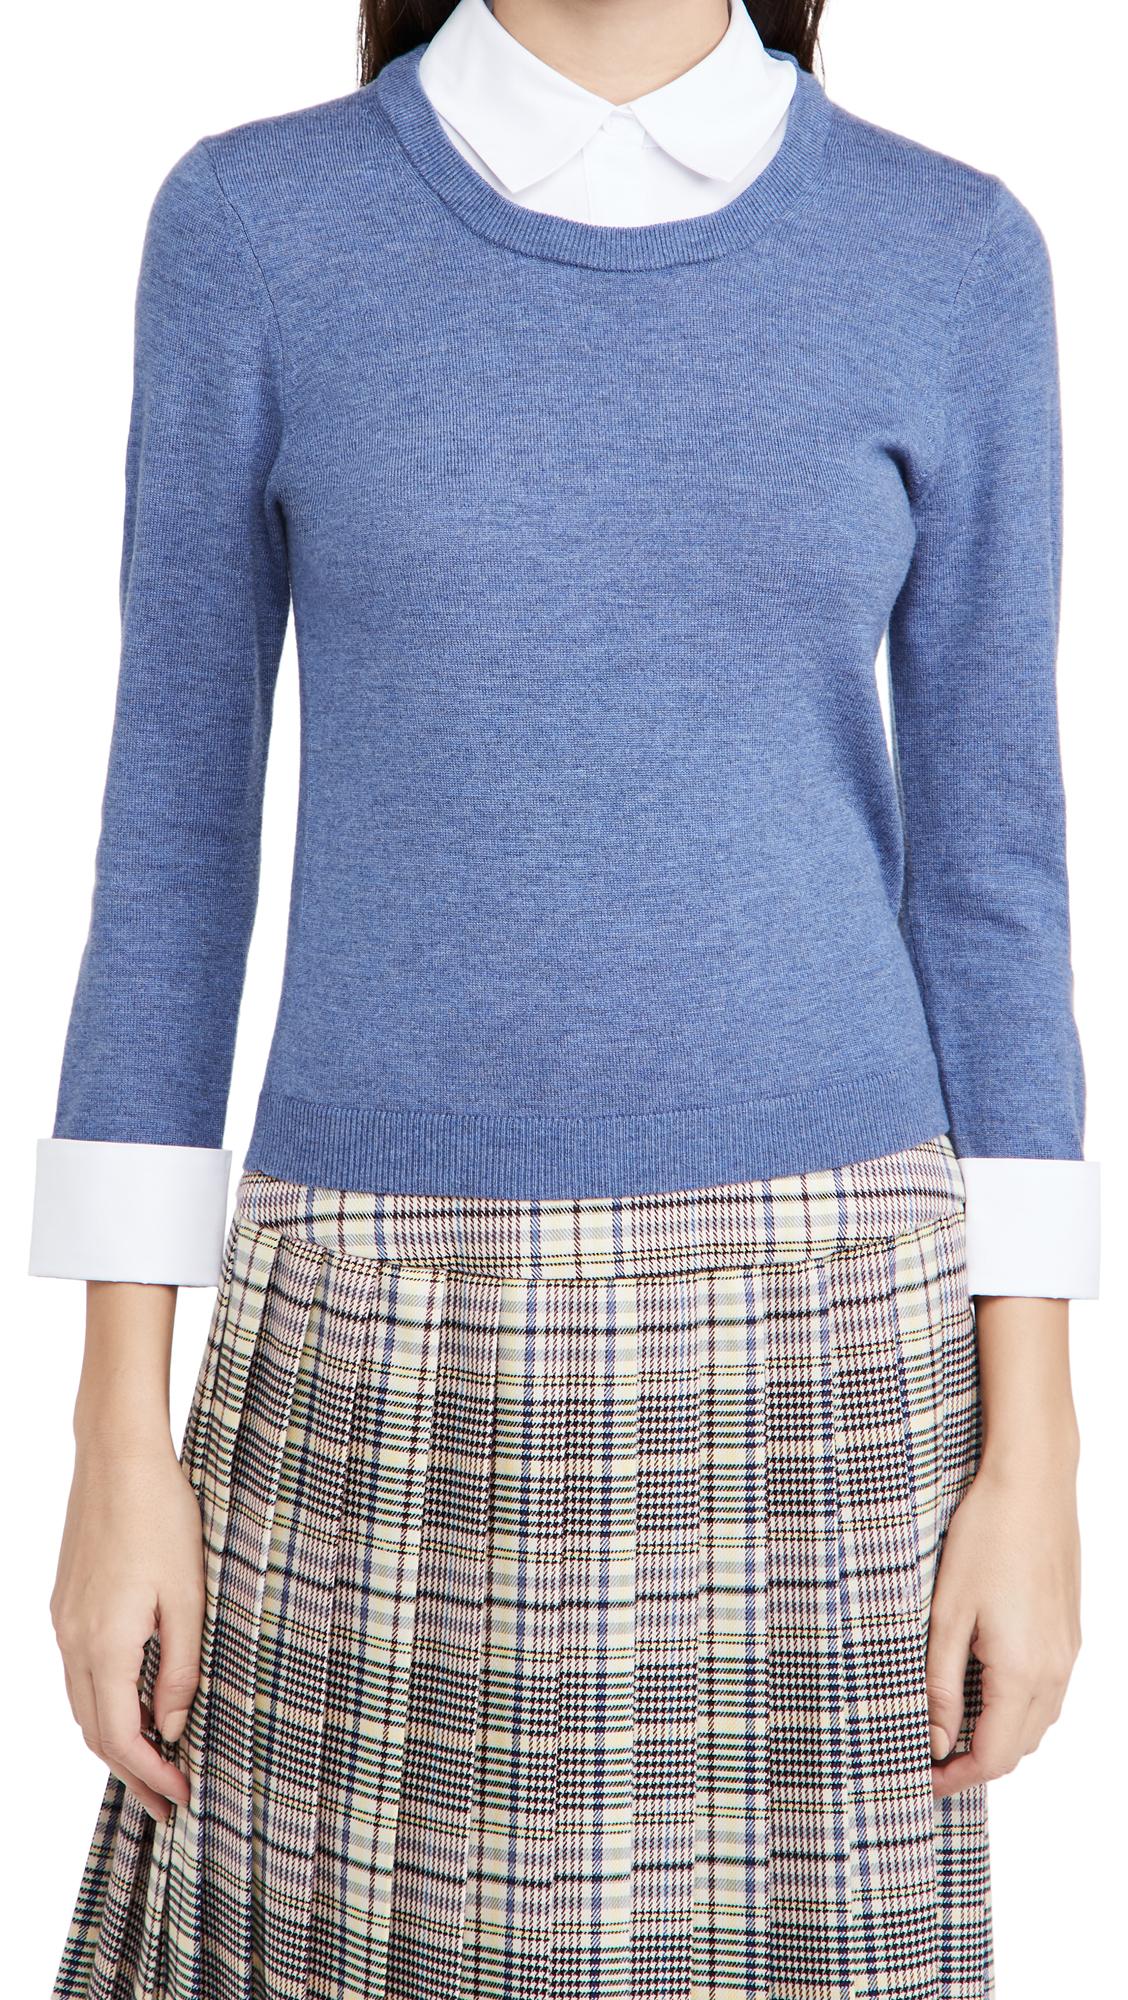 alice + olivia Porla 3/4 Sleeve Collared Sweater